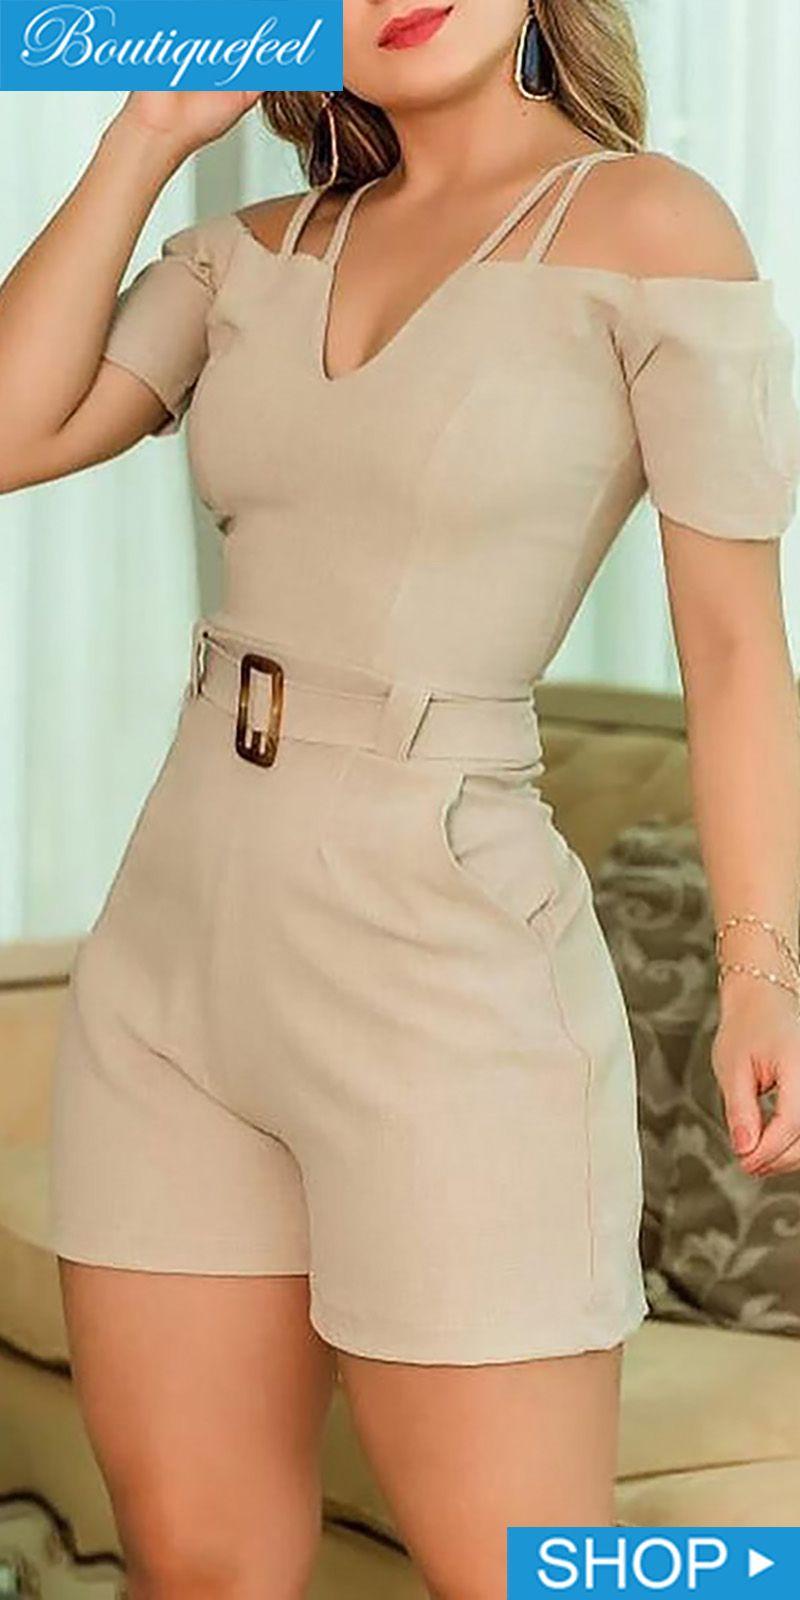 30 Ideas De Pantalon De Tela Mujer Pantalones De Moda Ropa De Moda Pantalon De Tela Mujer